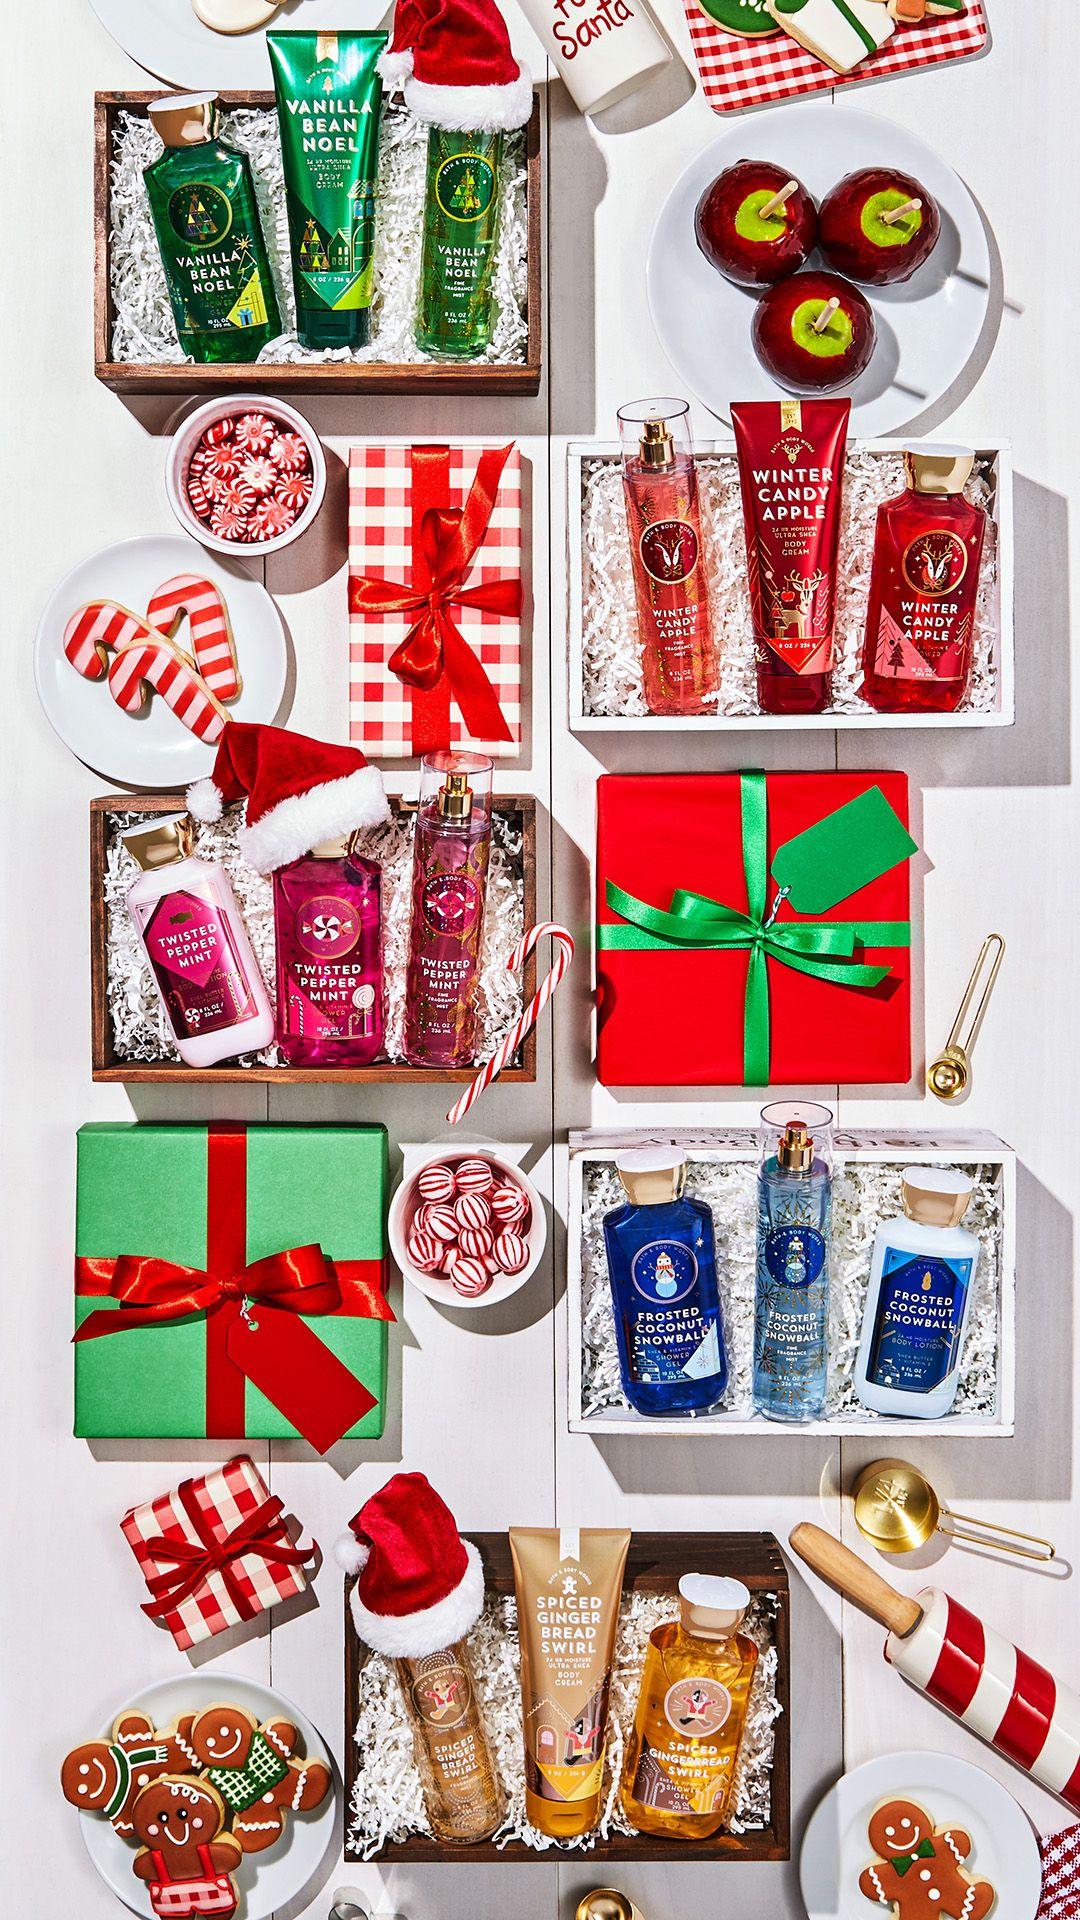 Bath Body Works Christmas Gifts Bath And Body Works Perfume Bath N Body Works Bath And Body Works